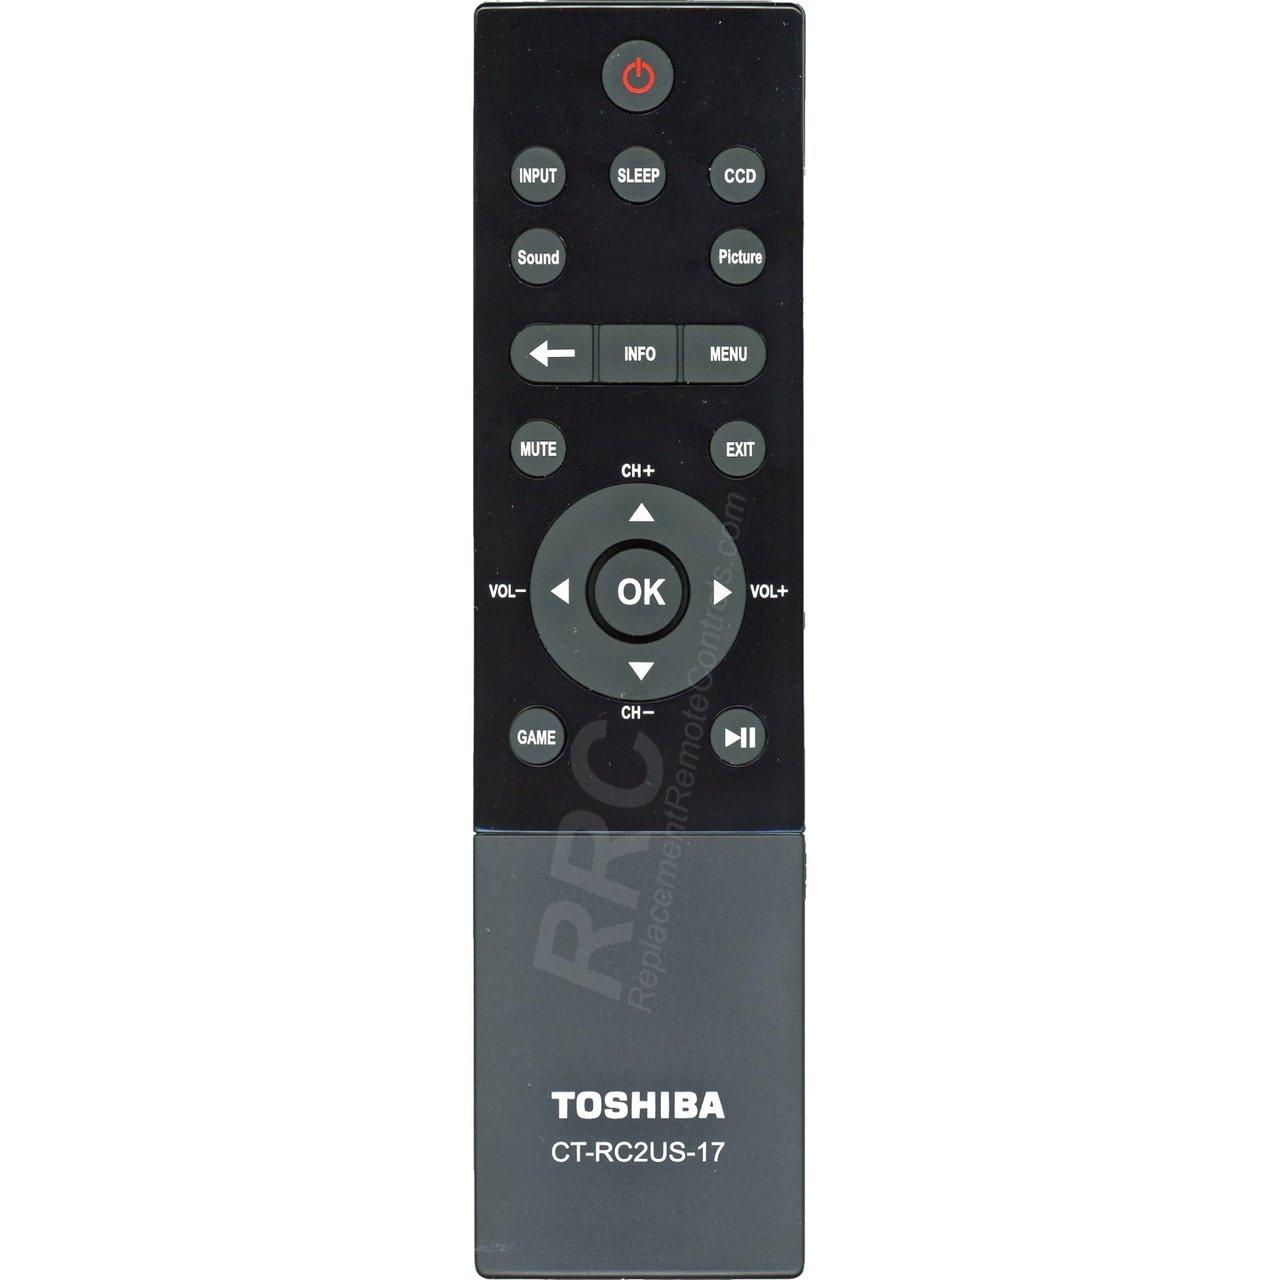 Toshiba CT-RC2US-17 LCD TV Remote Control for 32L221U, 43L621U, 49L621U, 55L421U, 55L621U, 65L621U Toshiba Electronics 4330254588